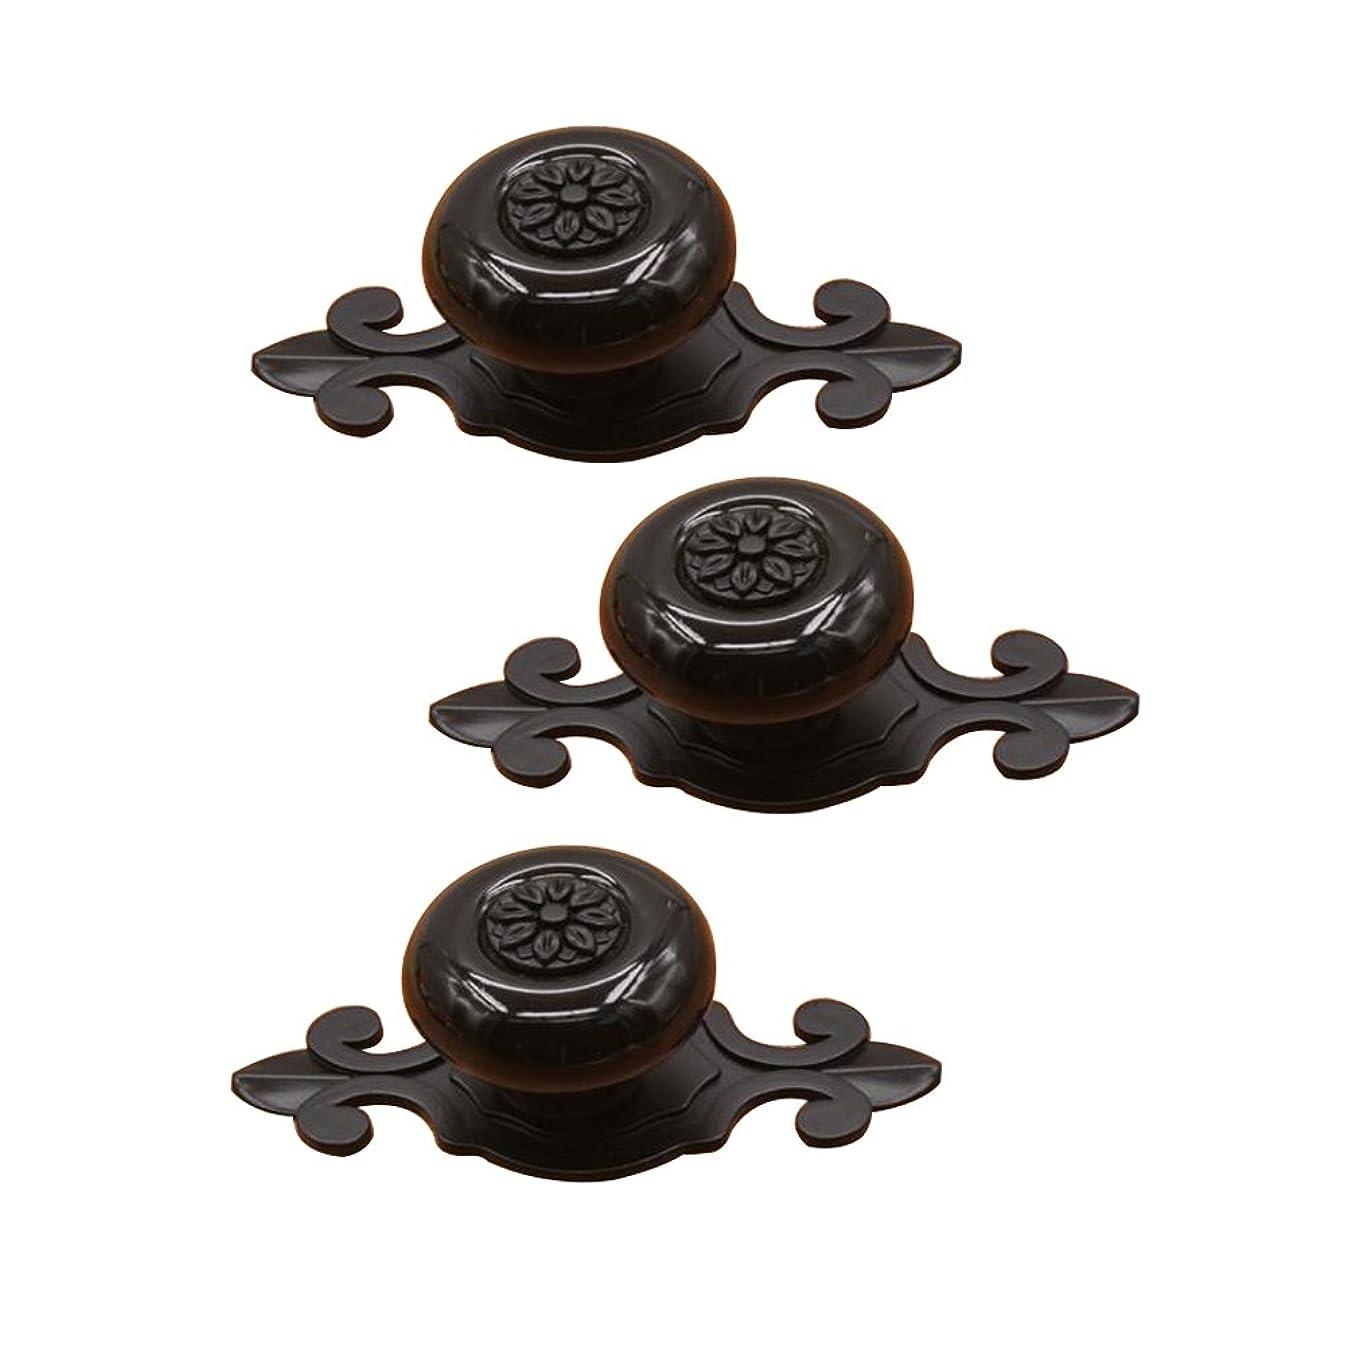 Cucumis Furniture Handle Zinc Alloy Cabinet Door Drawer Ceramic Antique Copper Color Handle 3Pcs (Black)